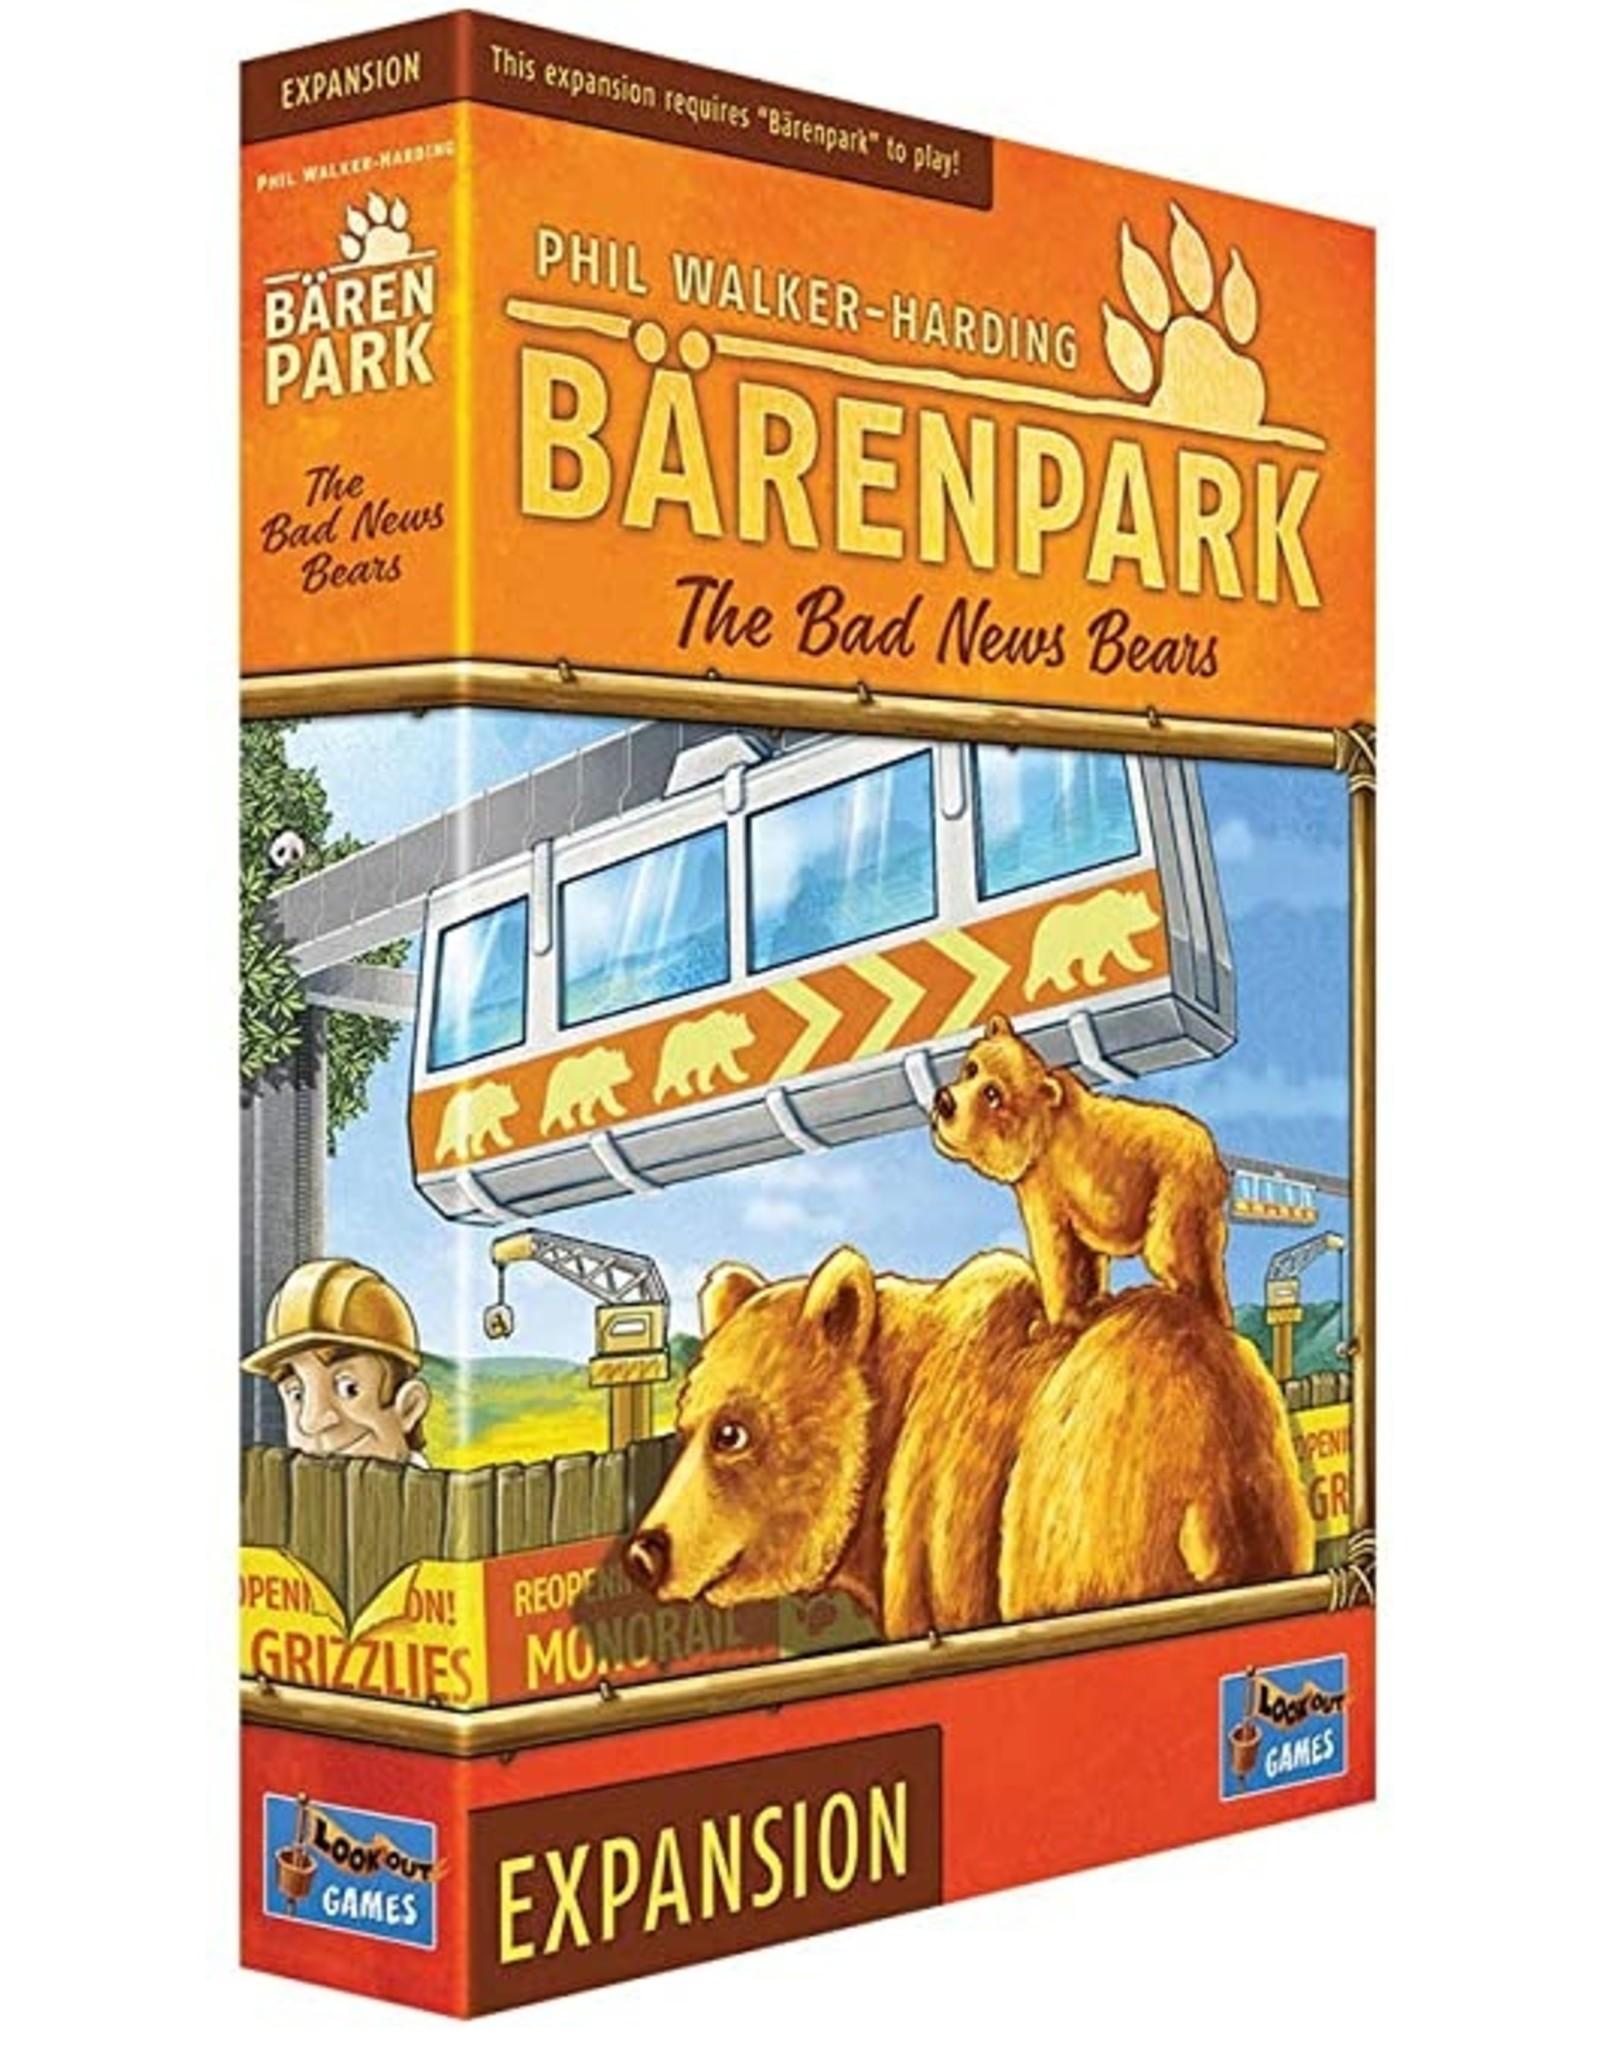 Barenpark: The Bad News Bears